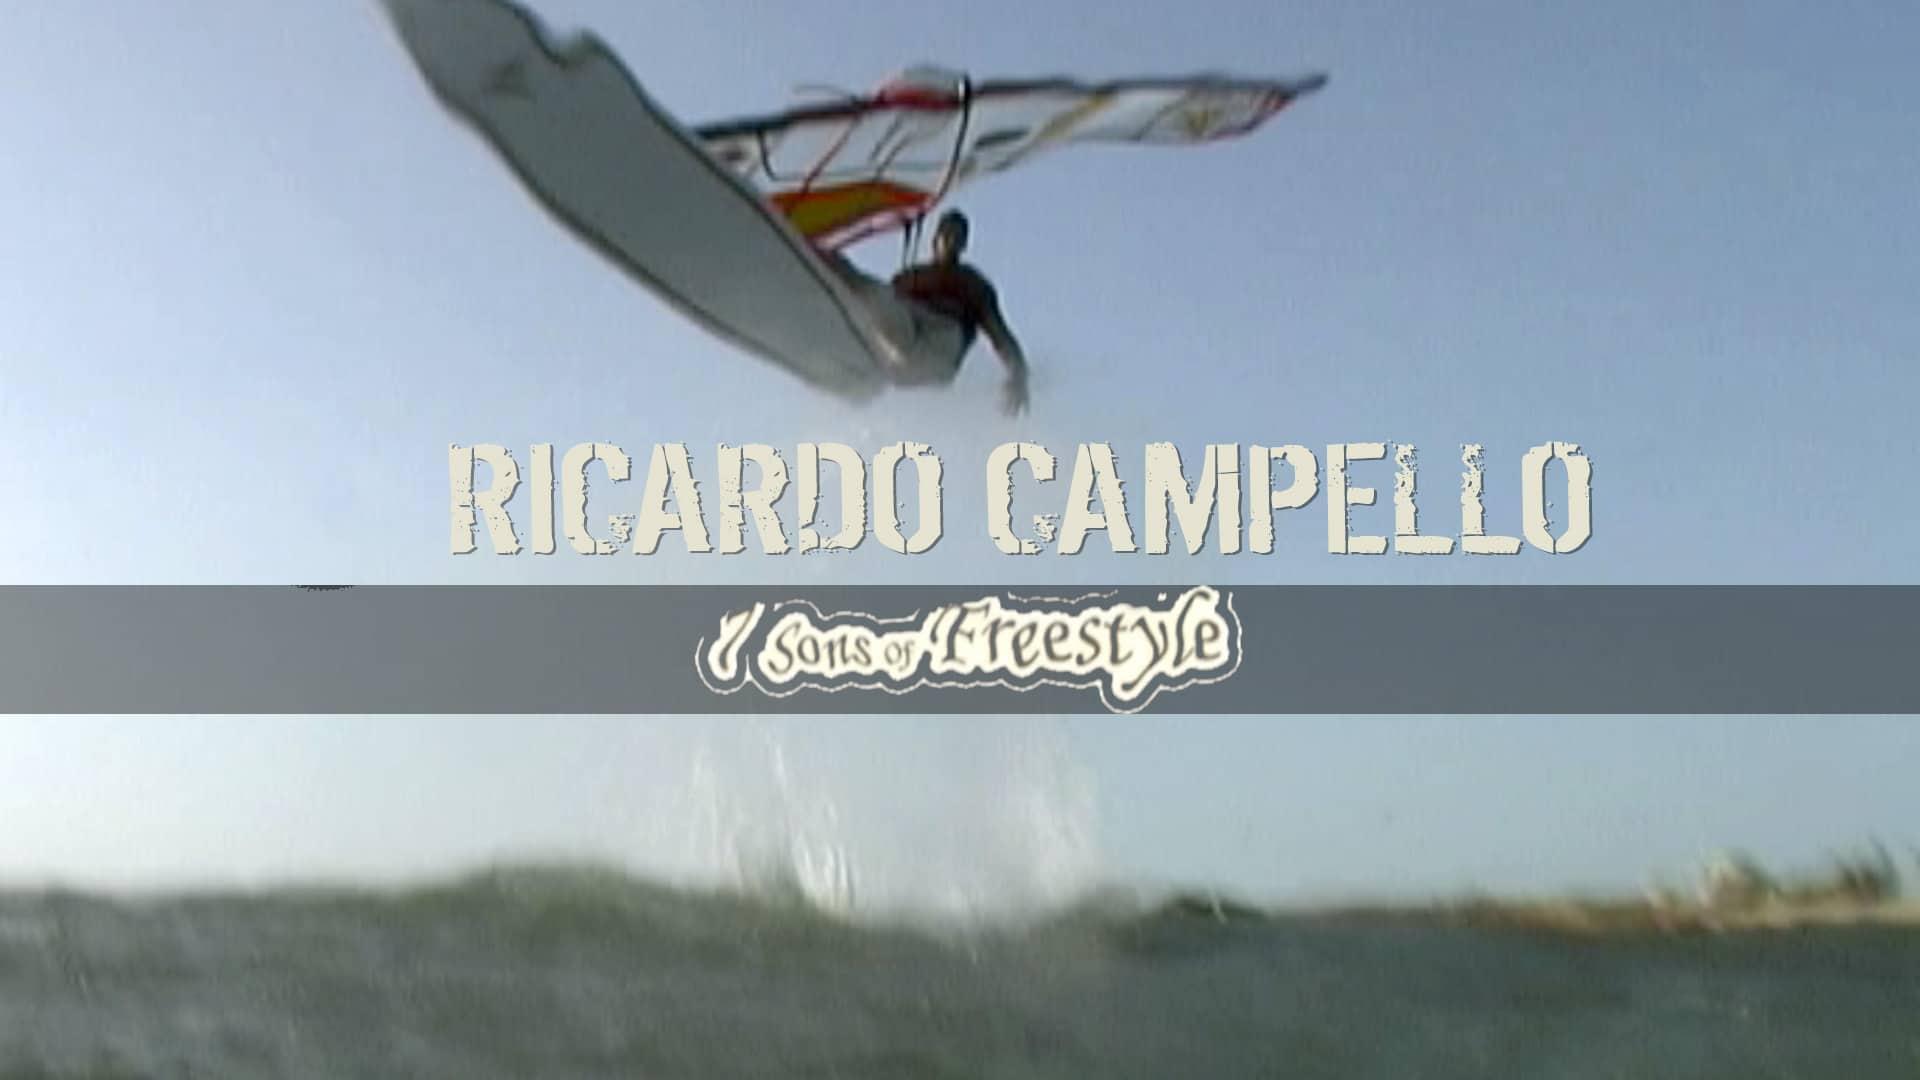 Ricardo Campello - 7 Sons of Freestyle